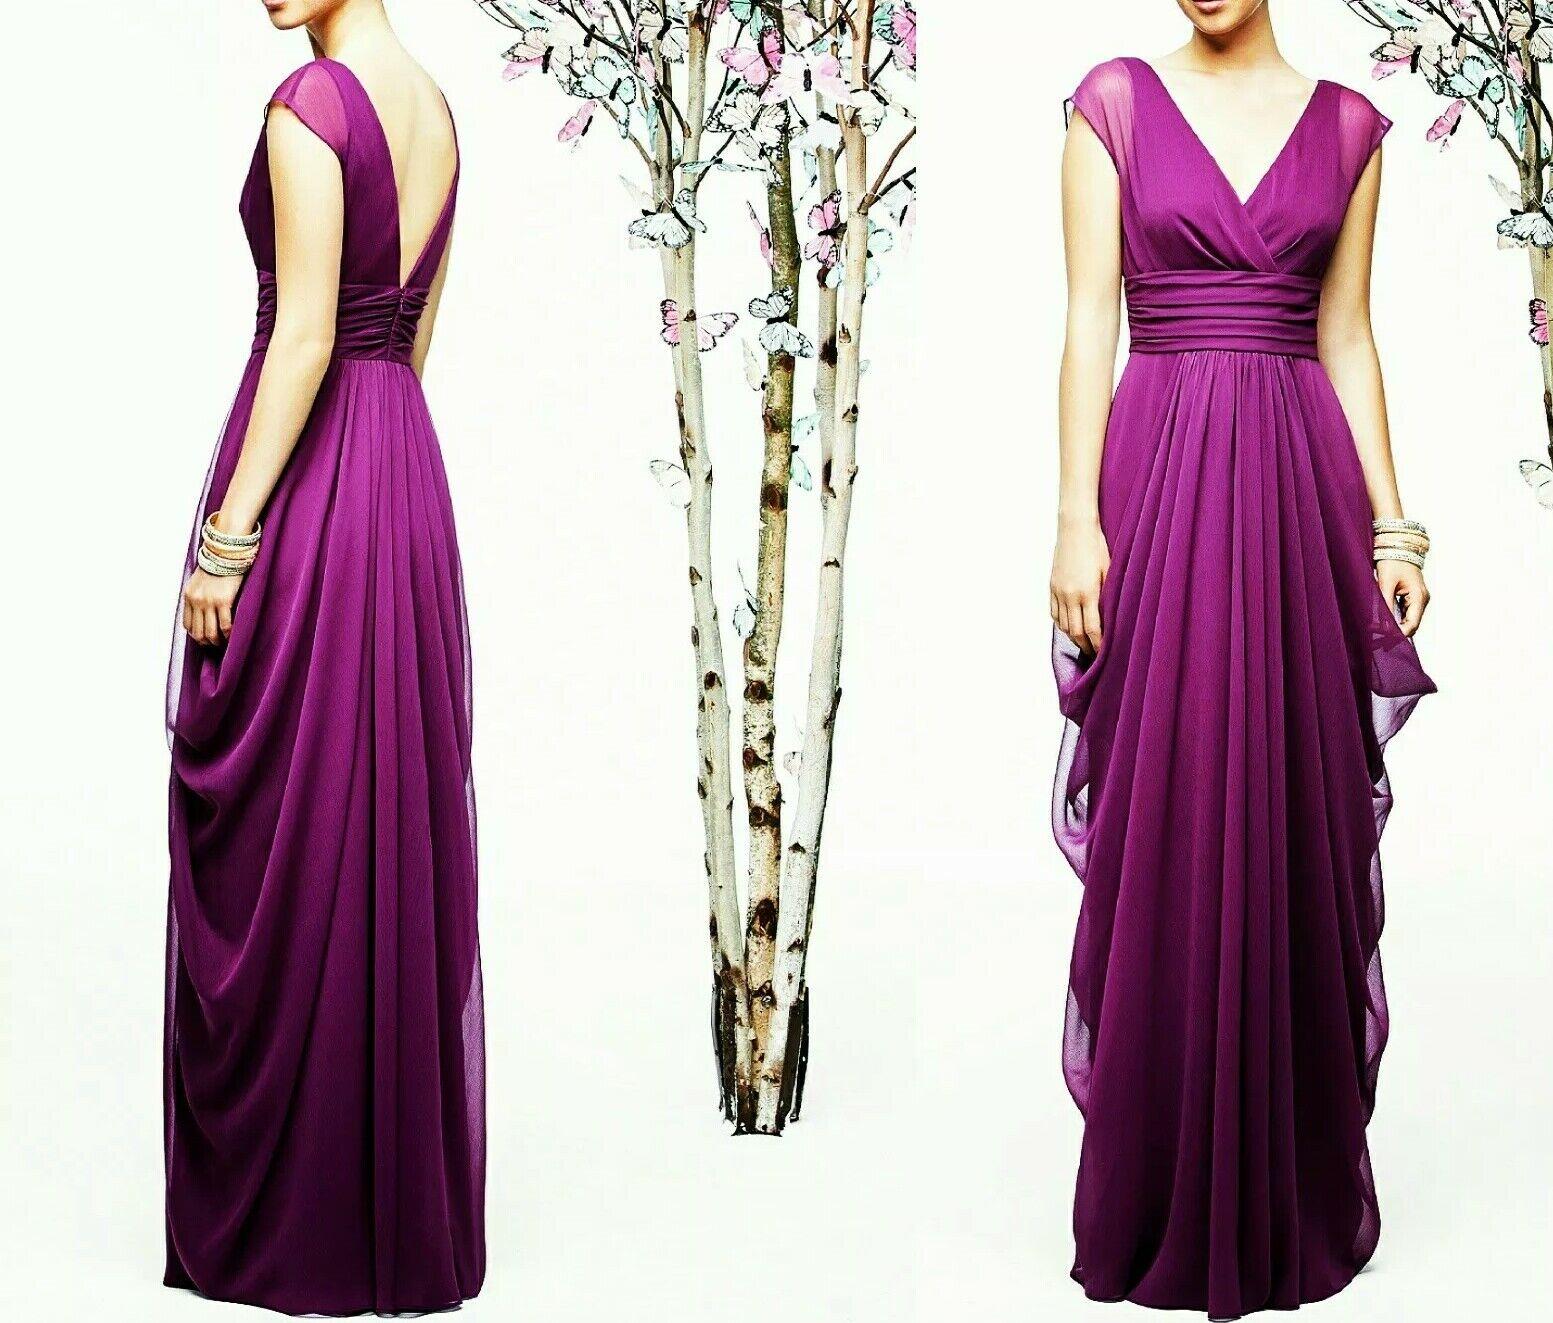 Lela Rose berry formal wedding long chiffon purple pink bridesmaid dress 14 NWT